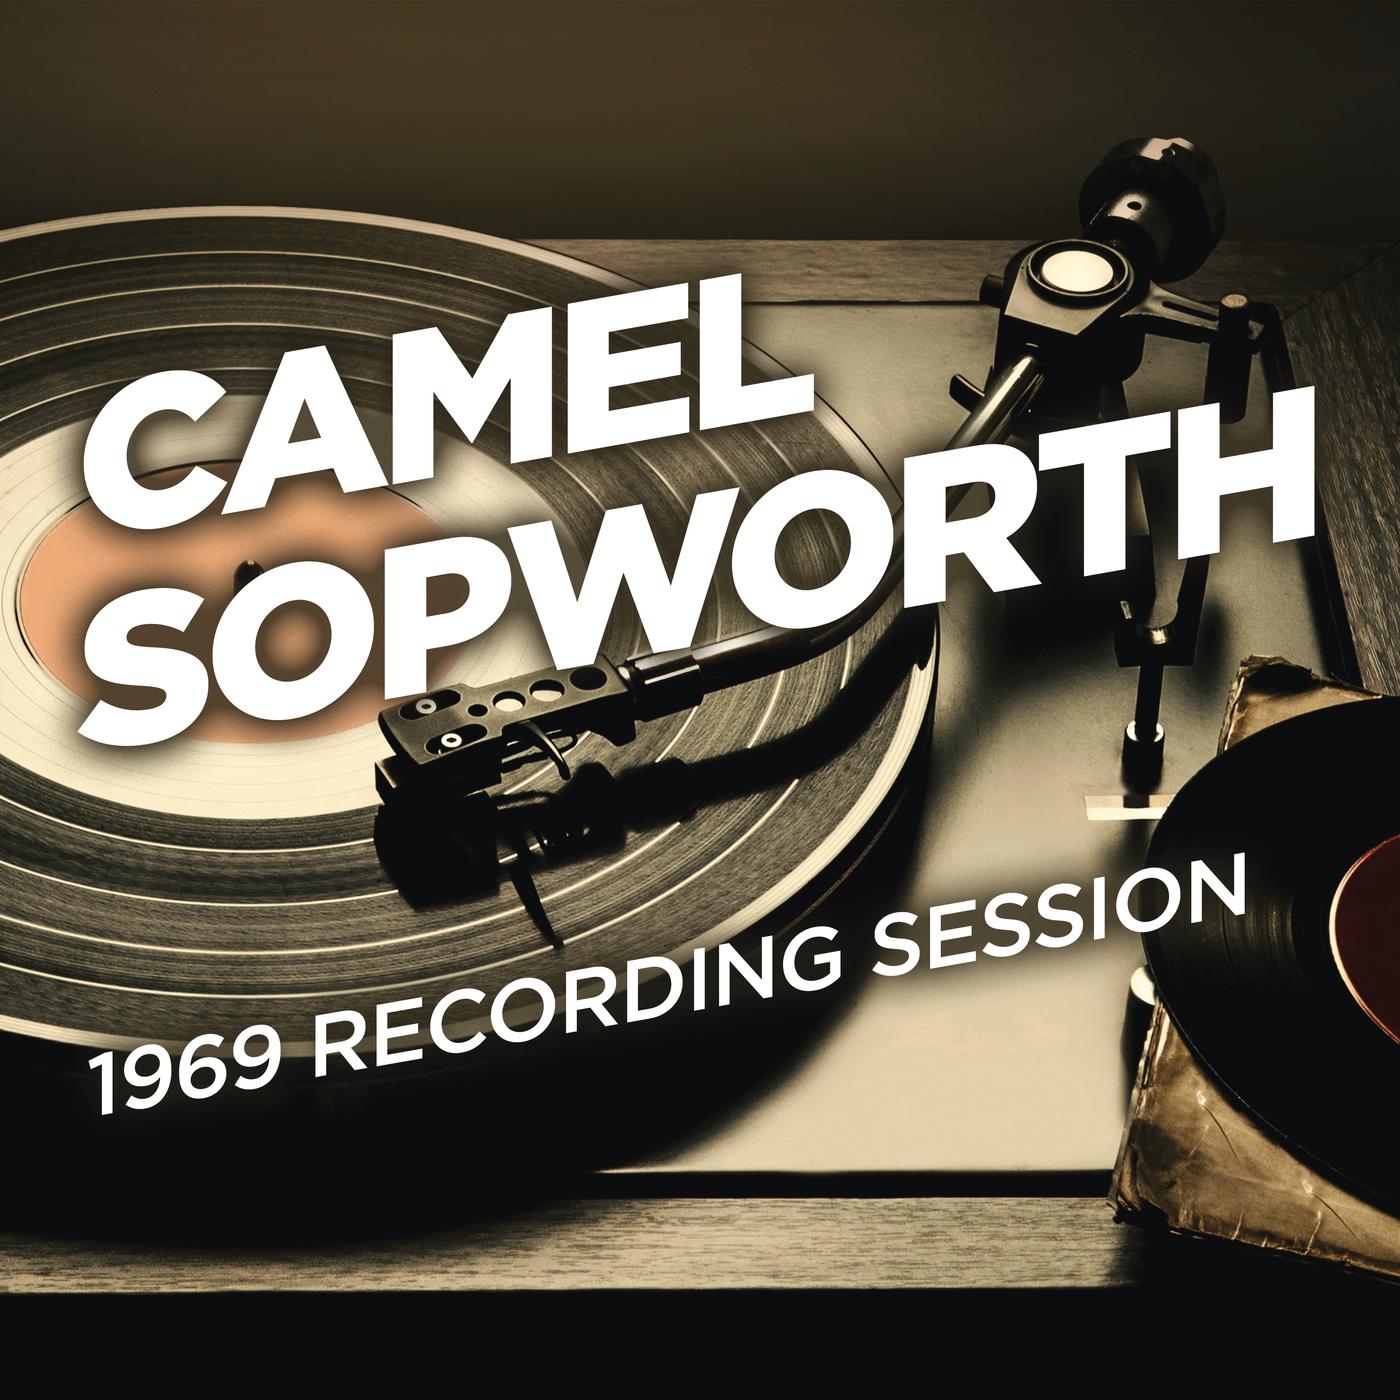 1969 Recording Session - Camel Sopworth